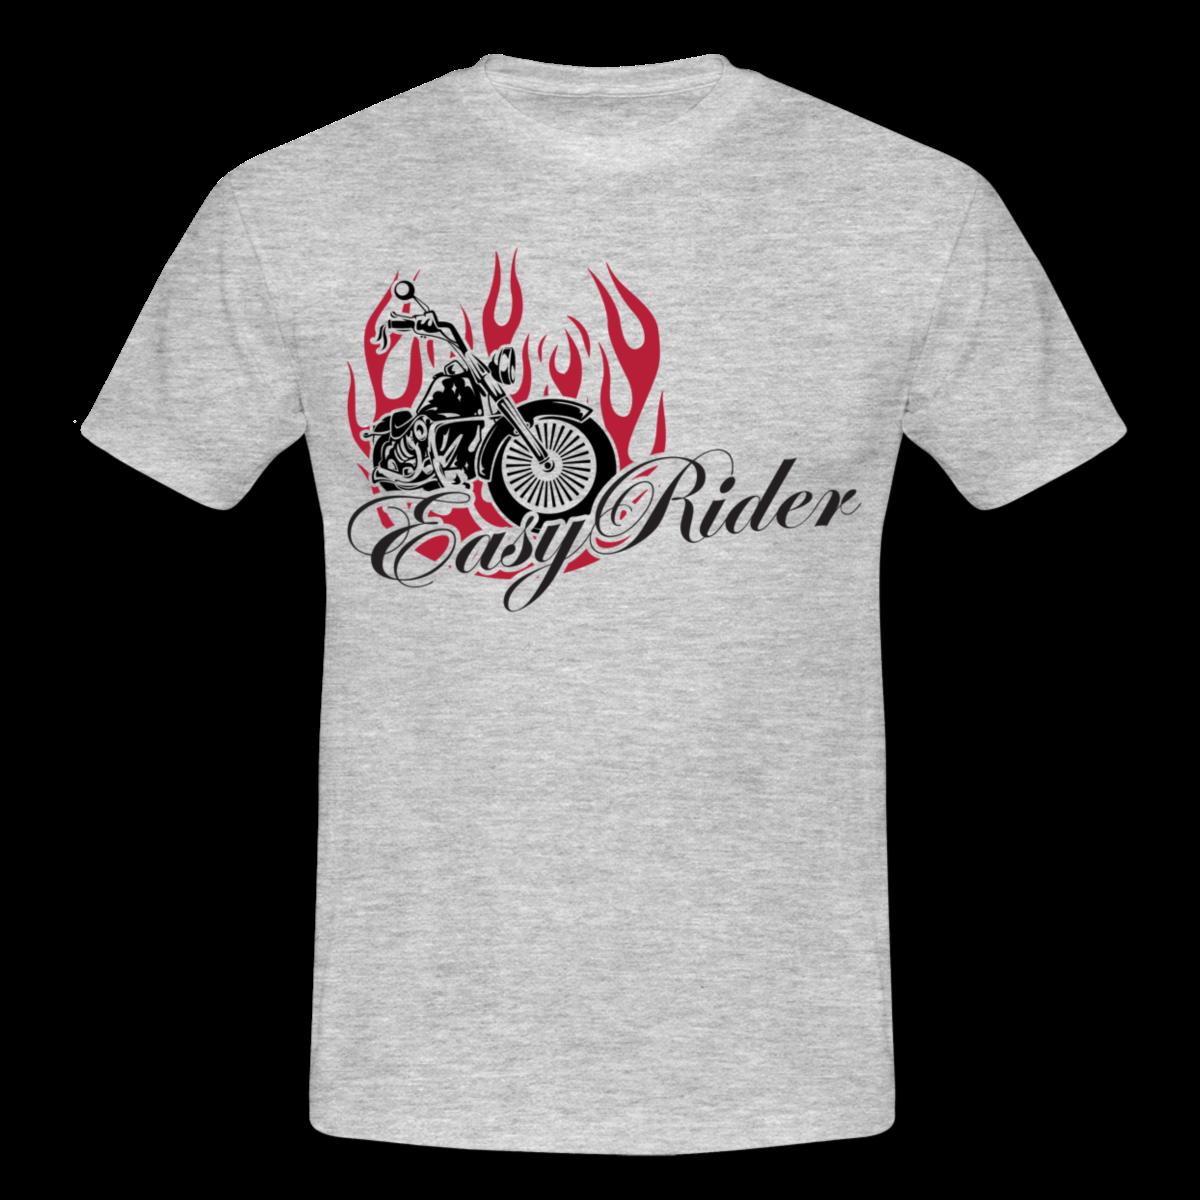 7133279e18ea5 Camiseta bike easy rider